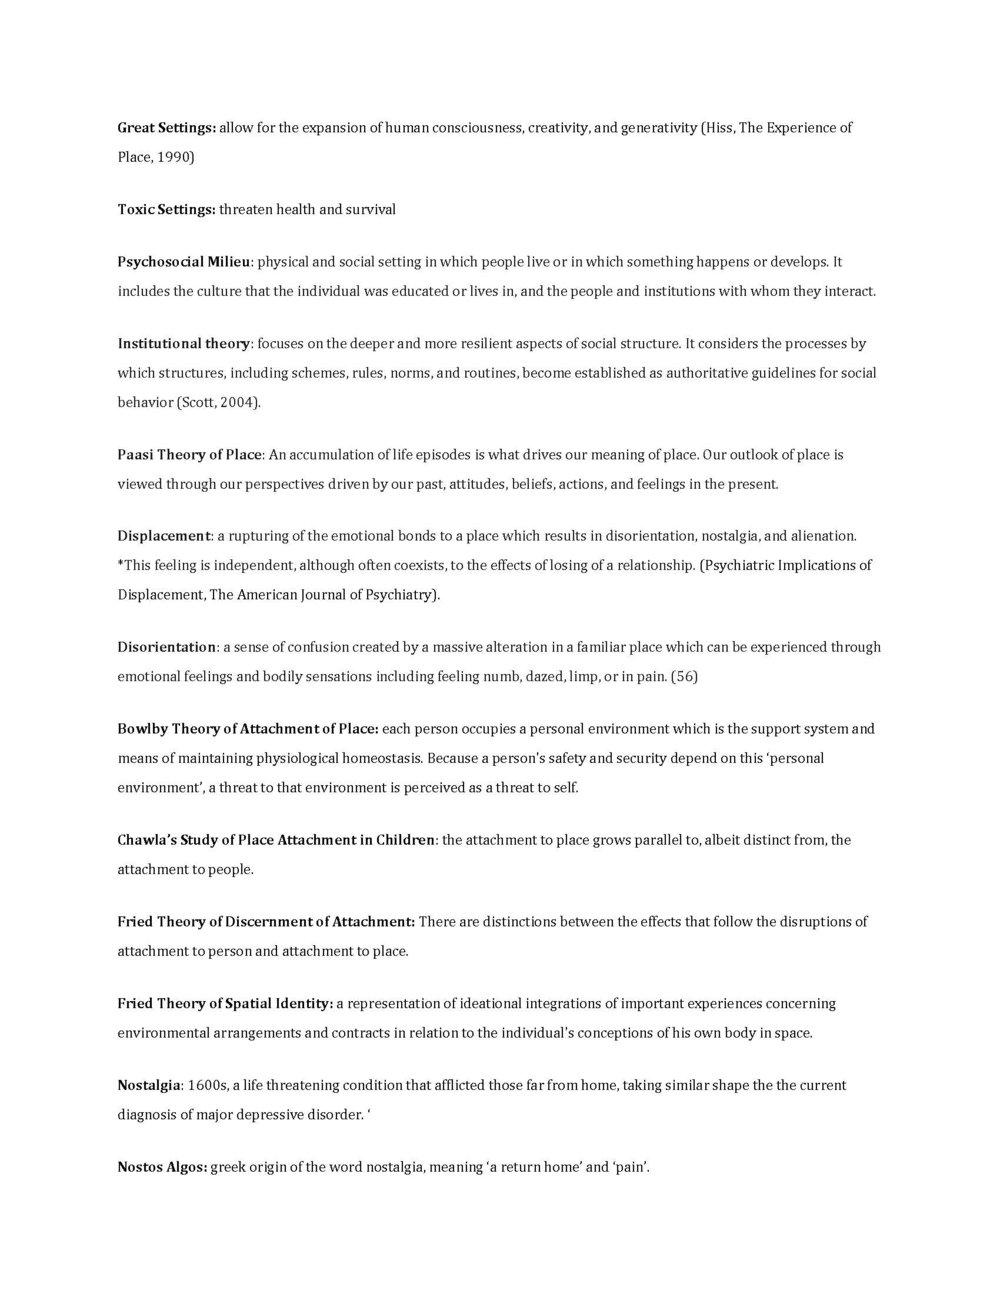 vocabularylist_Page_4.jpg